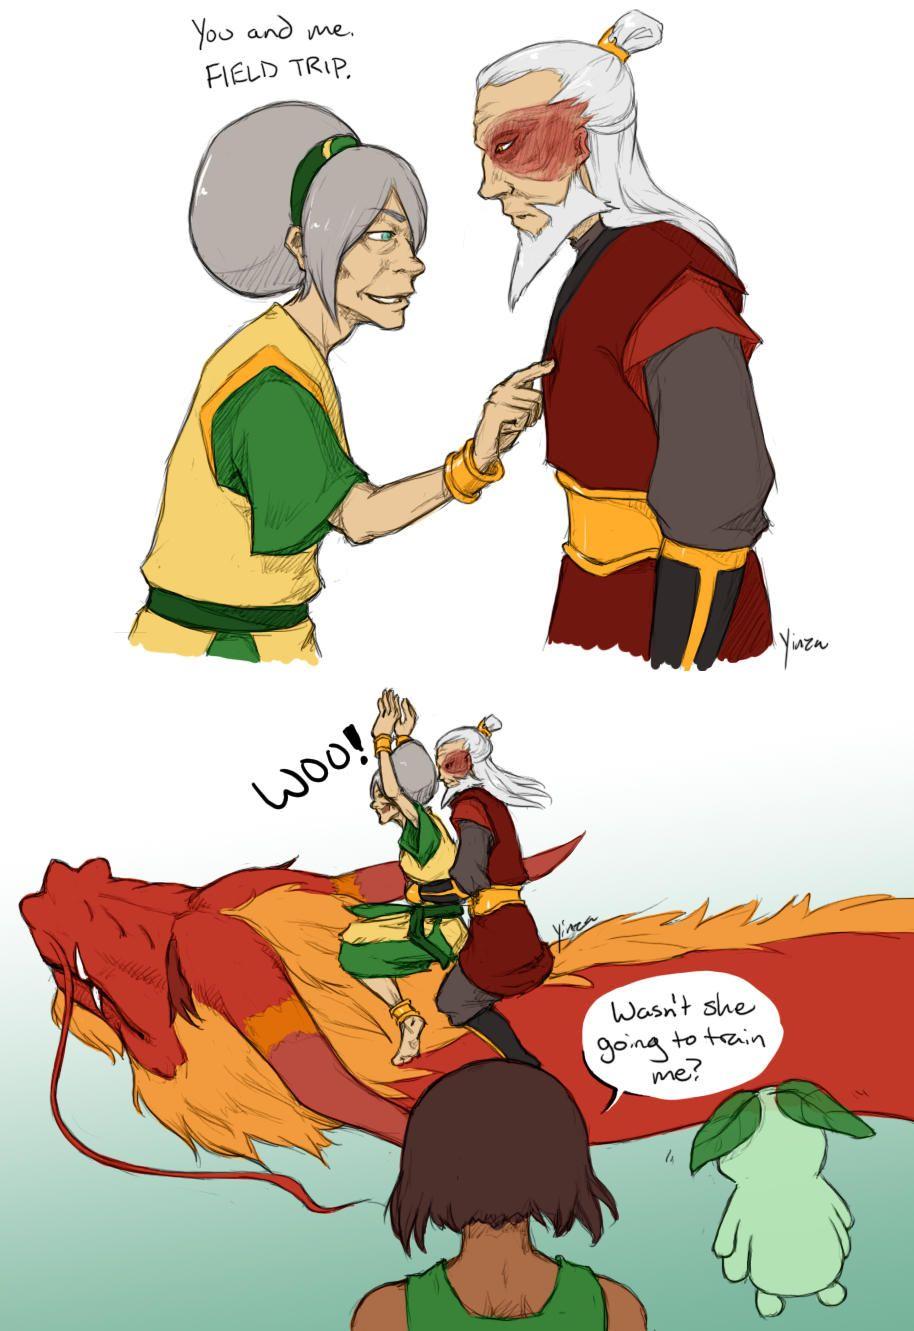 [Image - 850931] | Avatar: The Last Airbender / The Legend of Korra